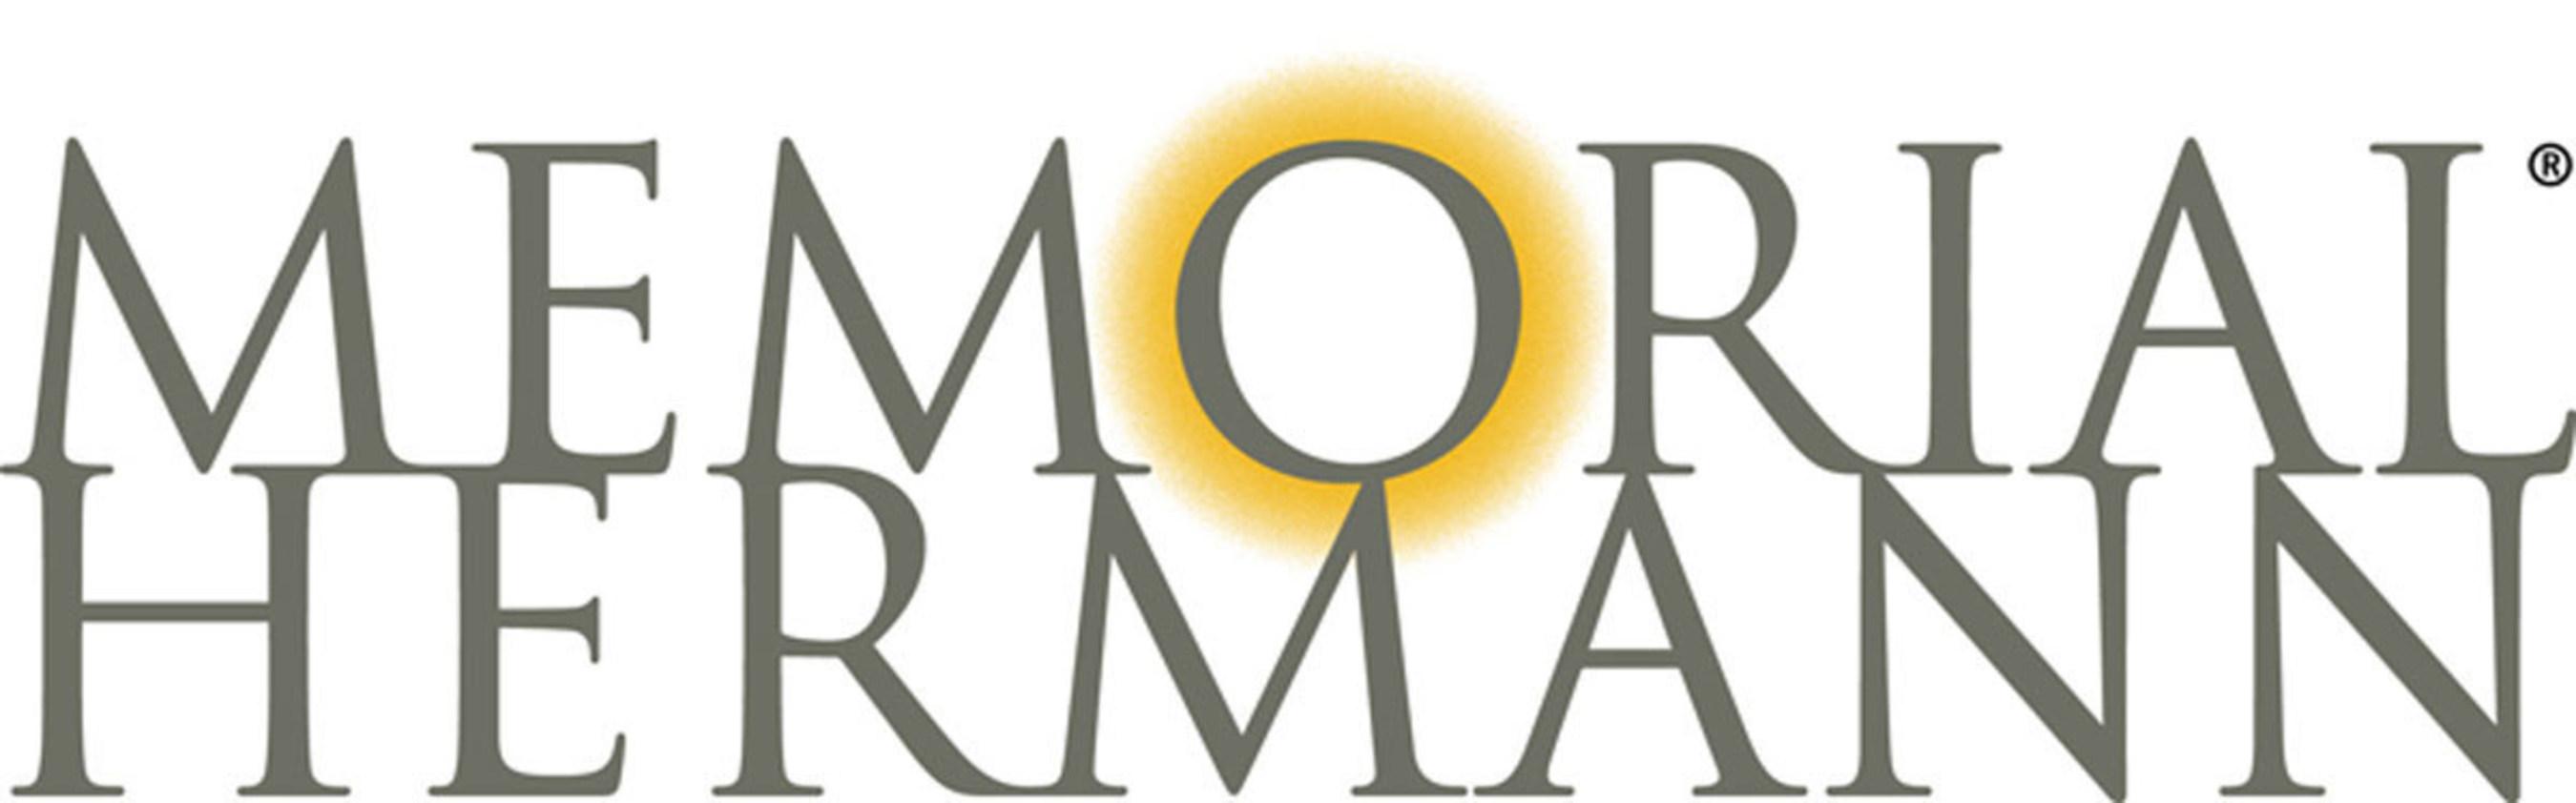 Memorial Hermann logo.